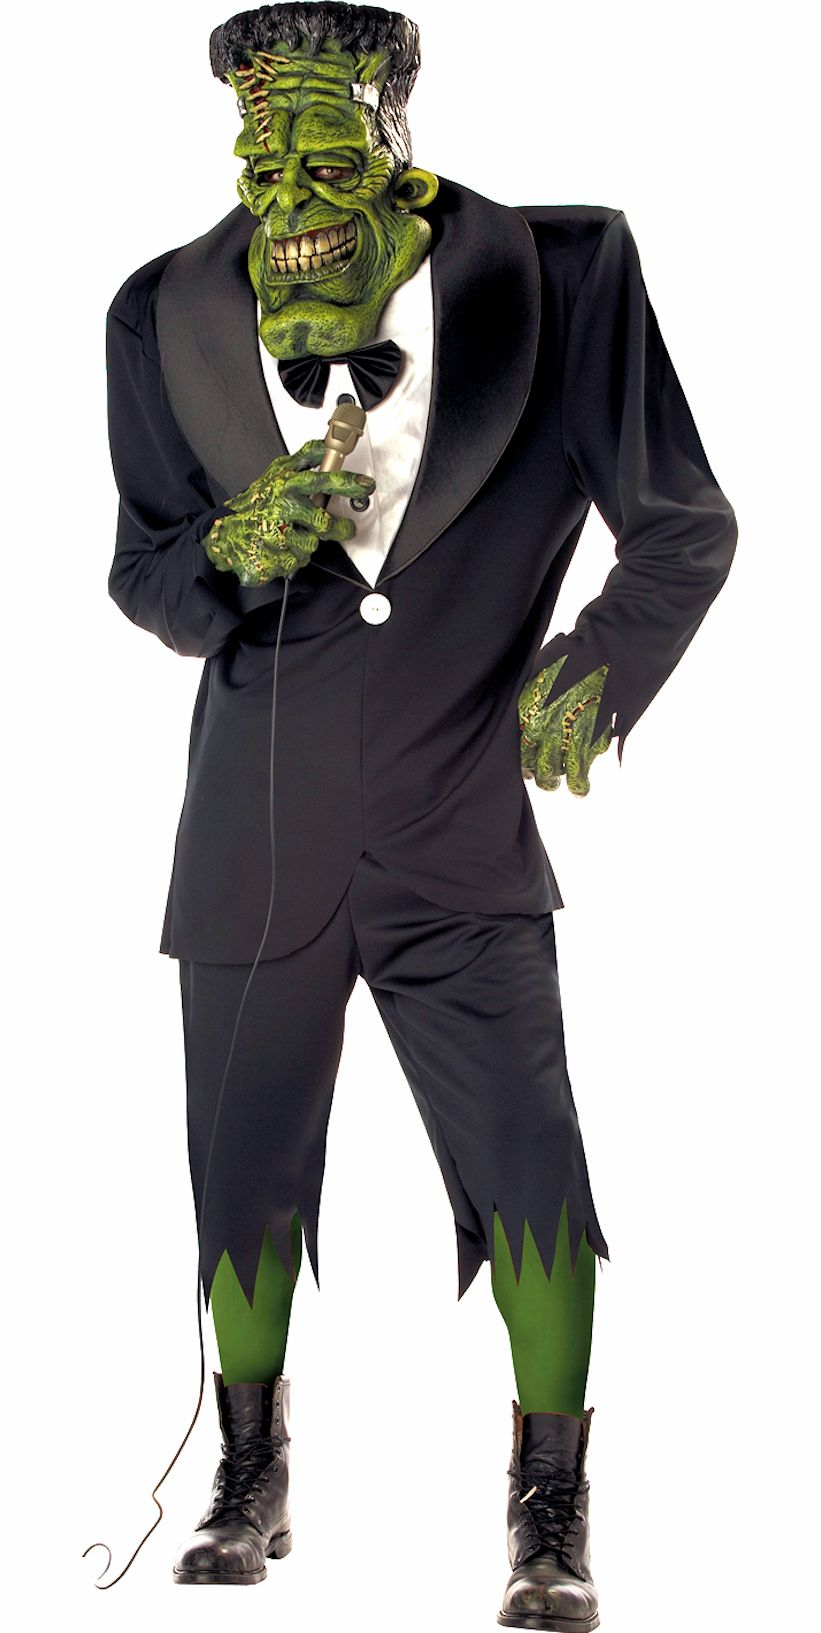 Big Frank Frankenstein costume